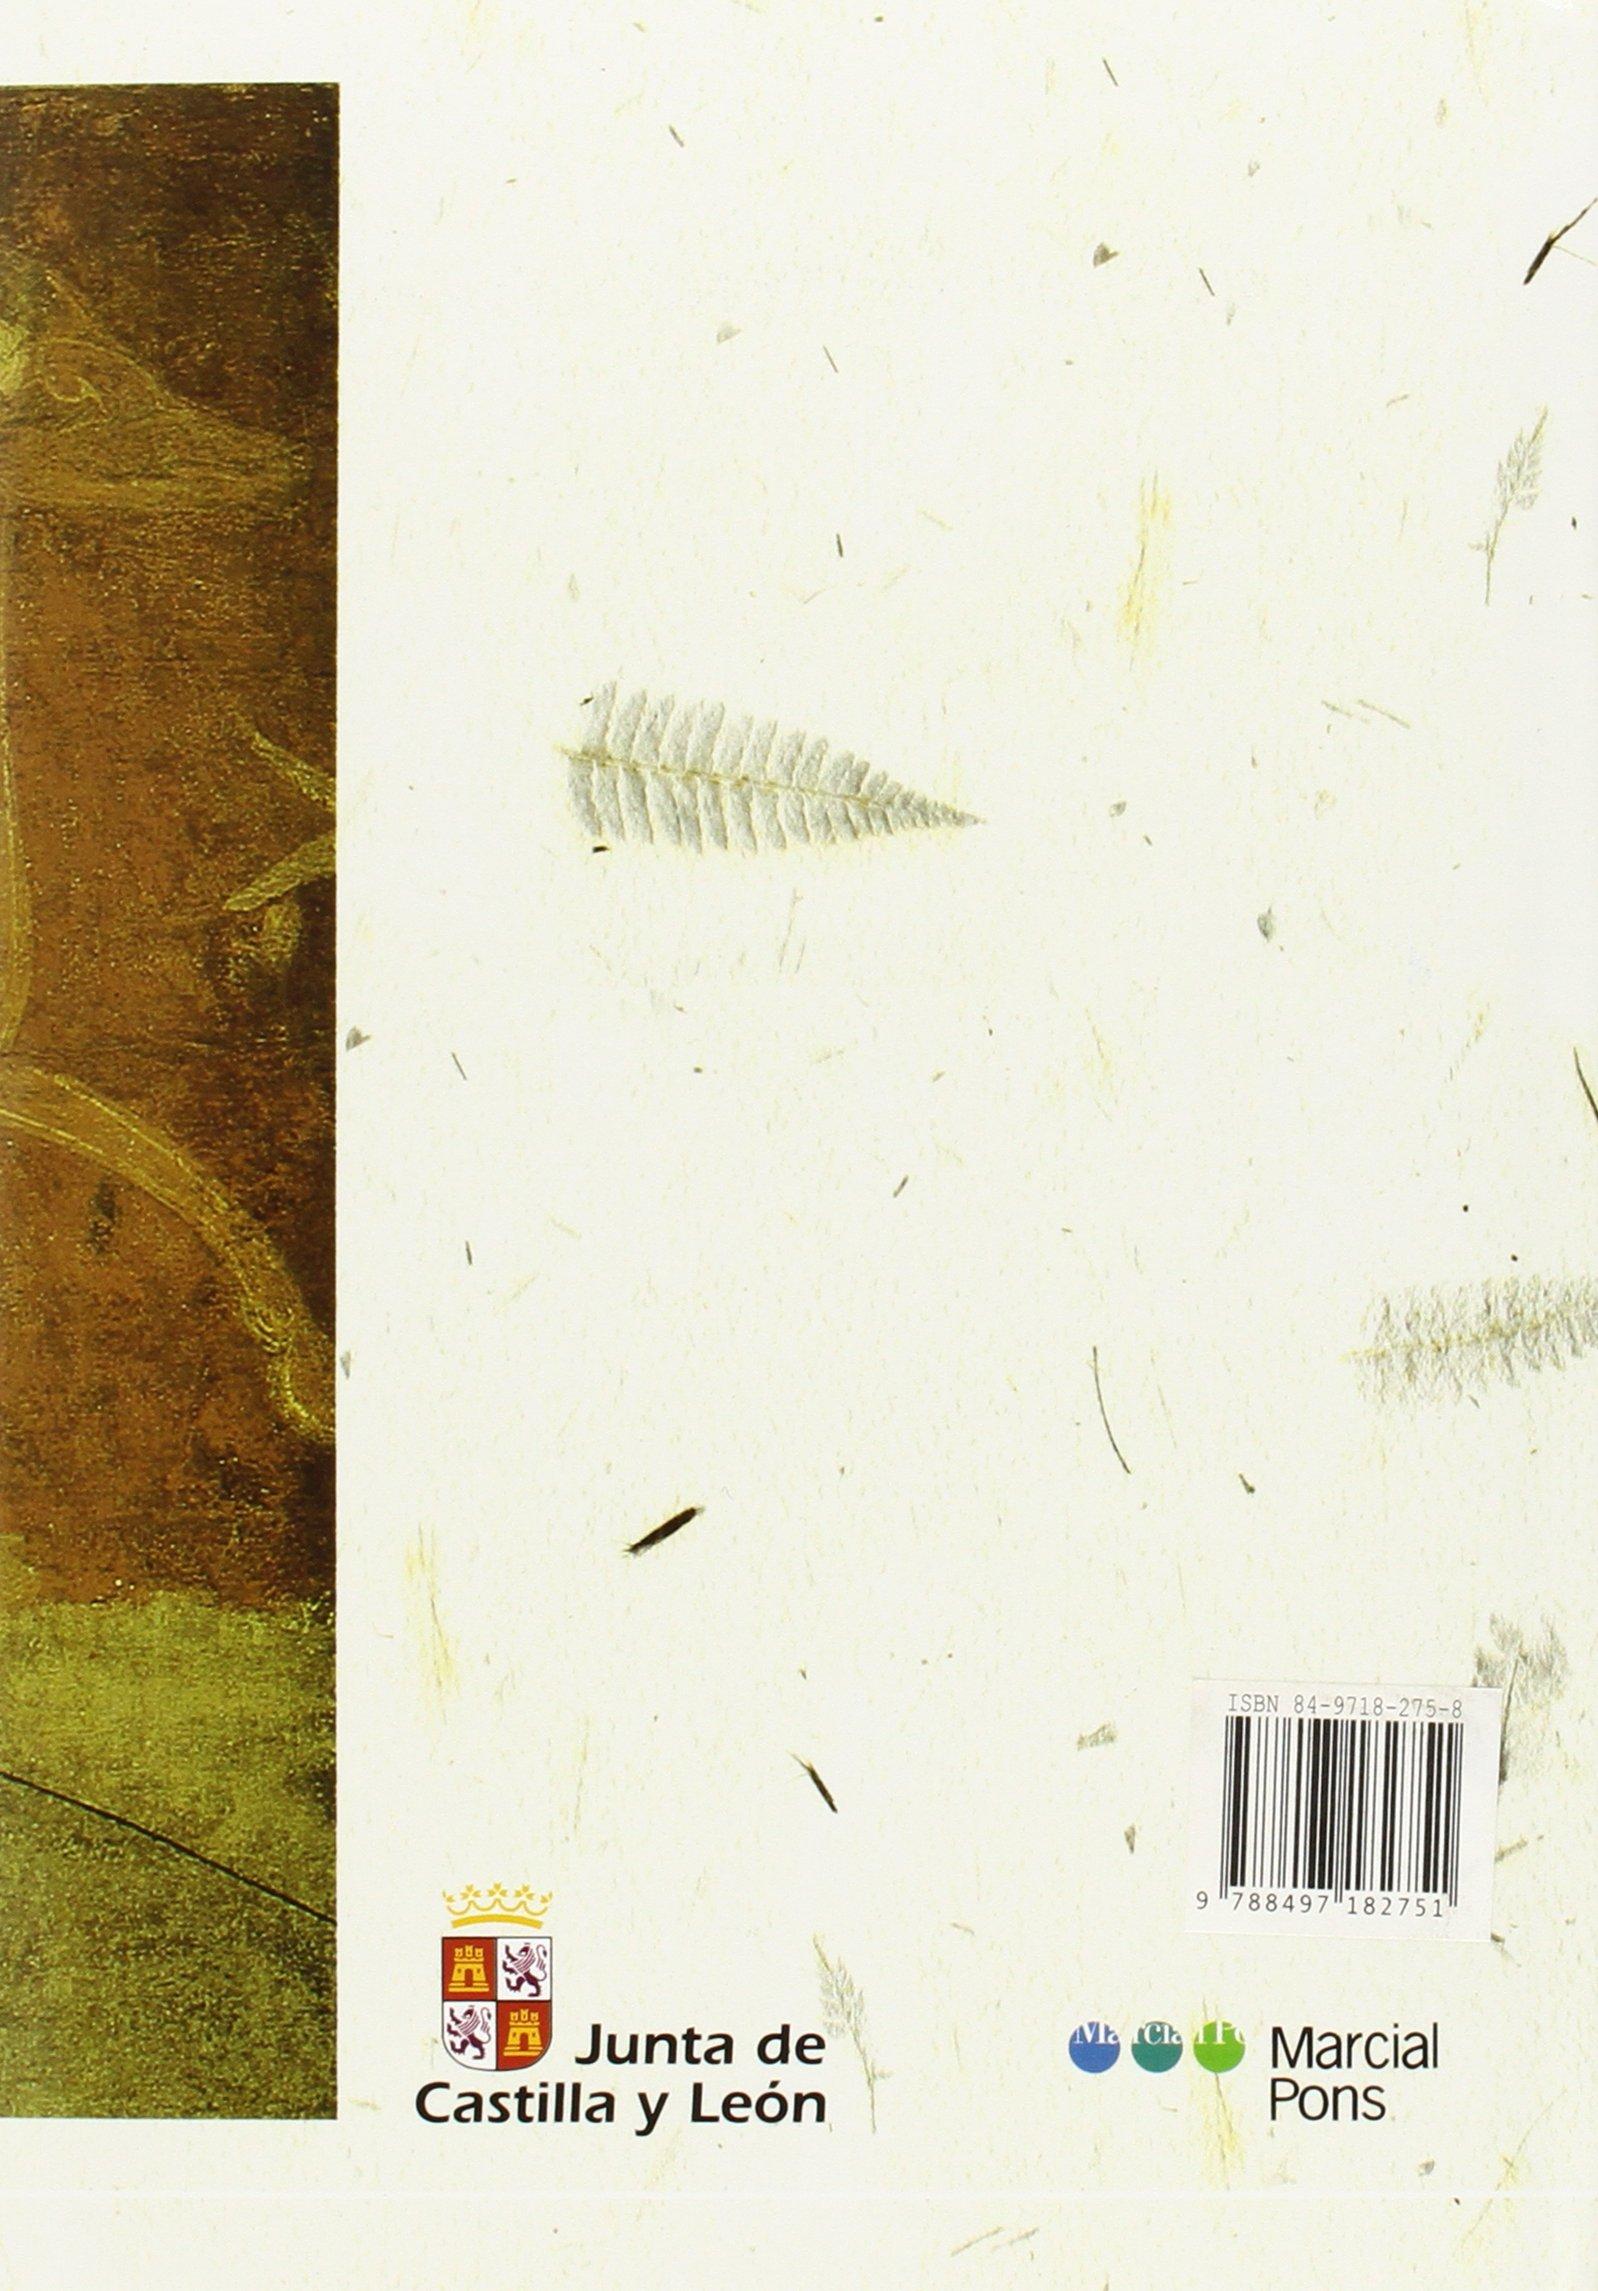 El Condado de Castilla, 711-1038: La Historia Frente a la Leyenda (Spanish Edition): GONZALO MARTINEZ DIEZ: 9788497182751: Amazon.com: Books